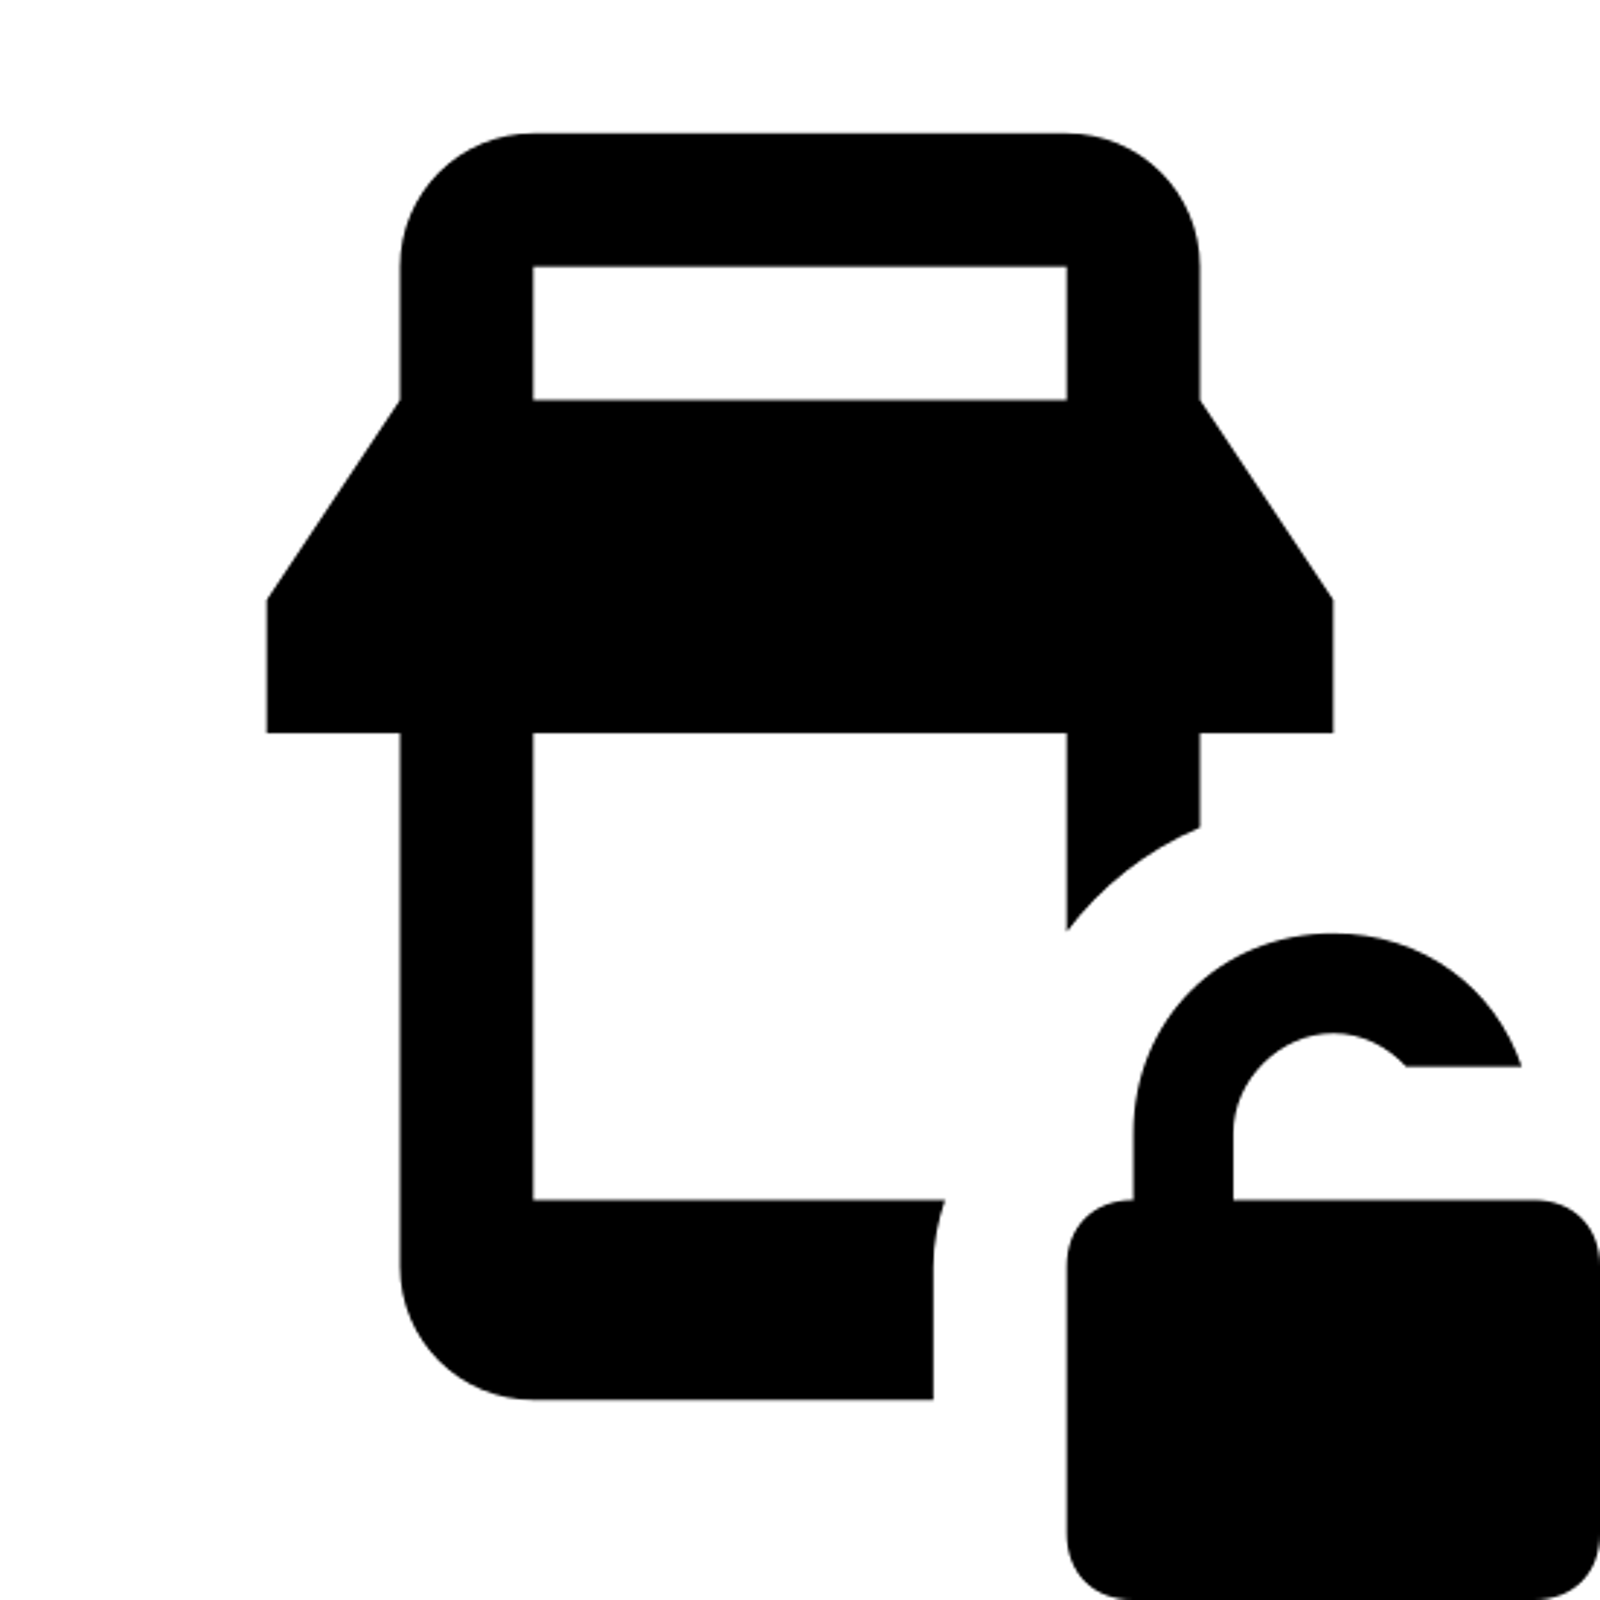 Mobile Shop Secured Login icon